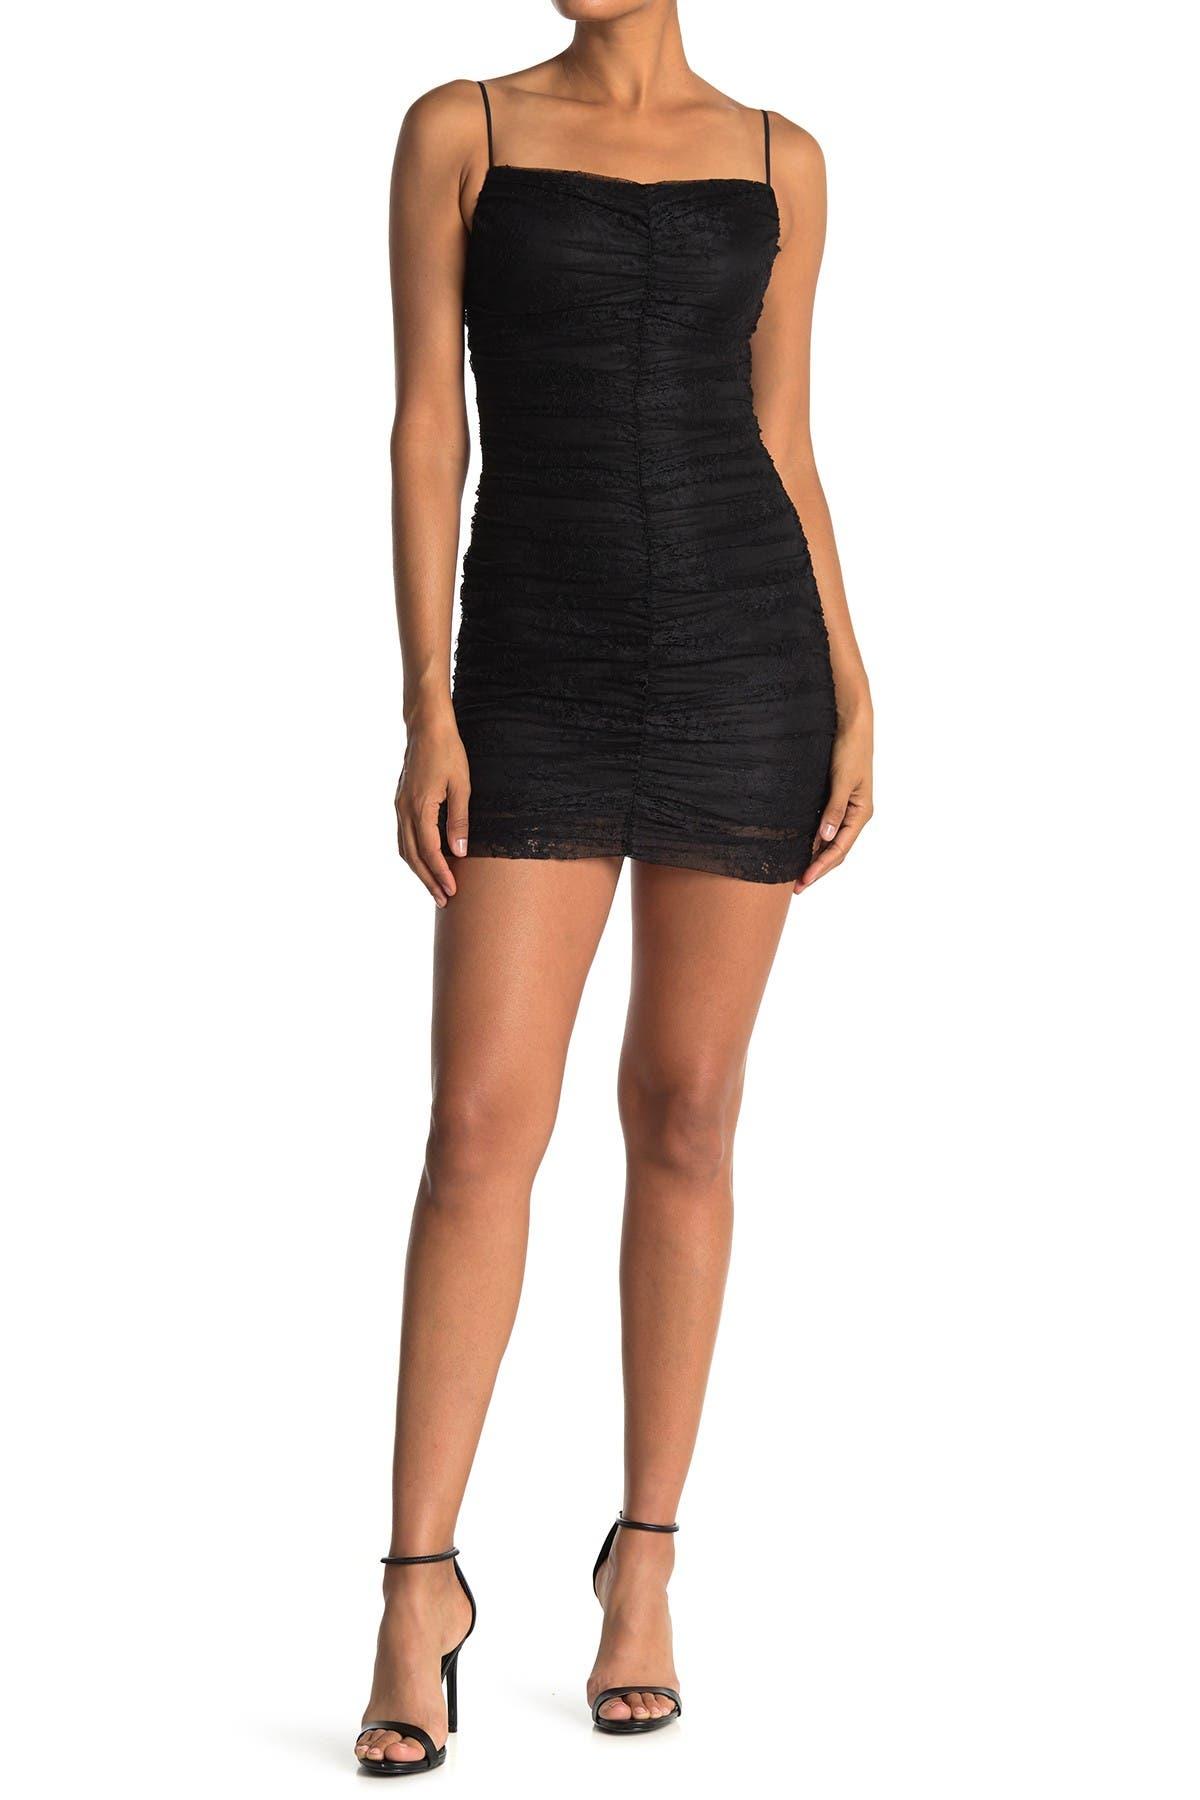 Image of Lush Ruched Lace Mini Dress